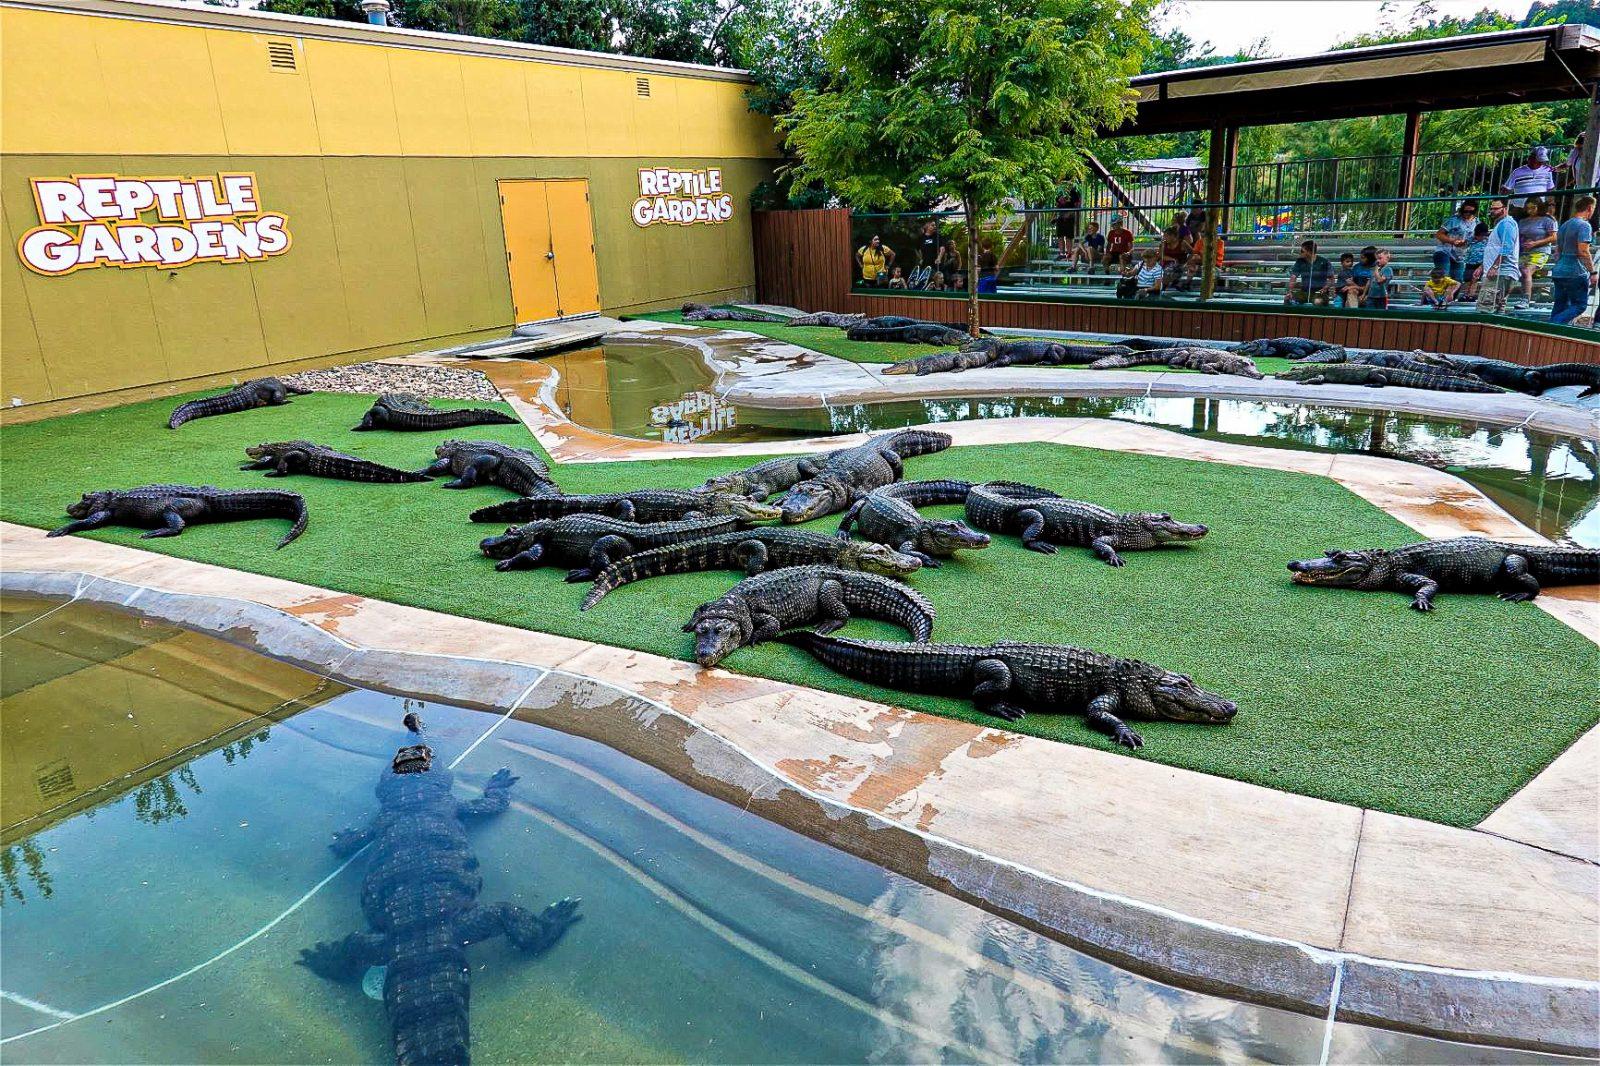 krokodilleoppvisning usa